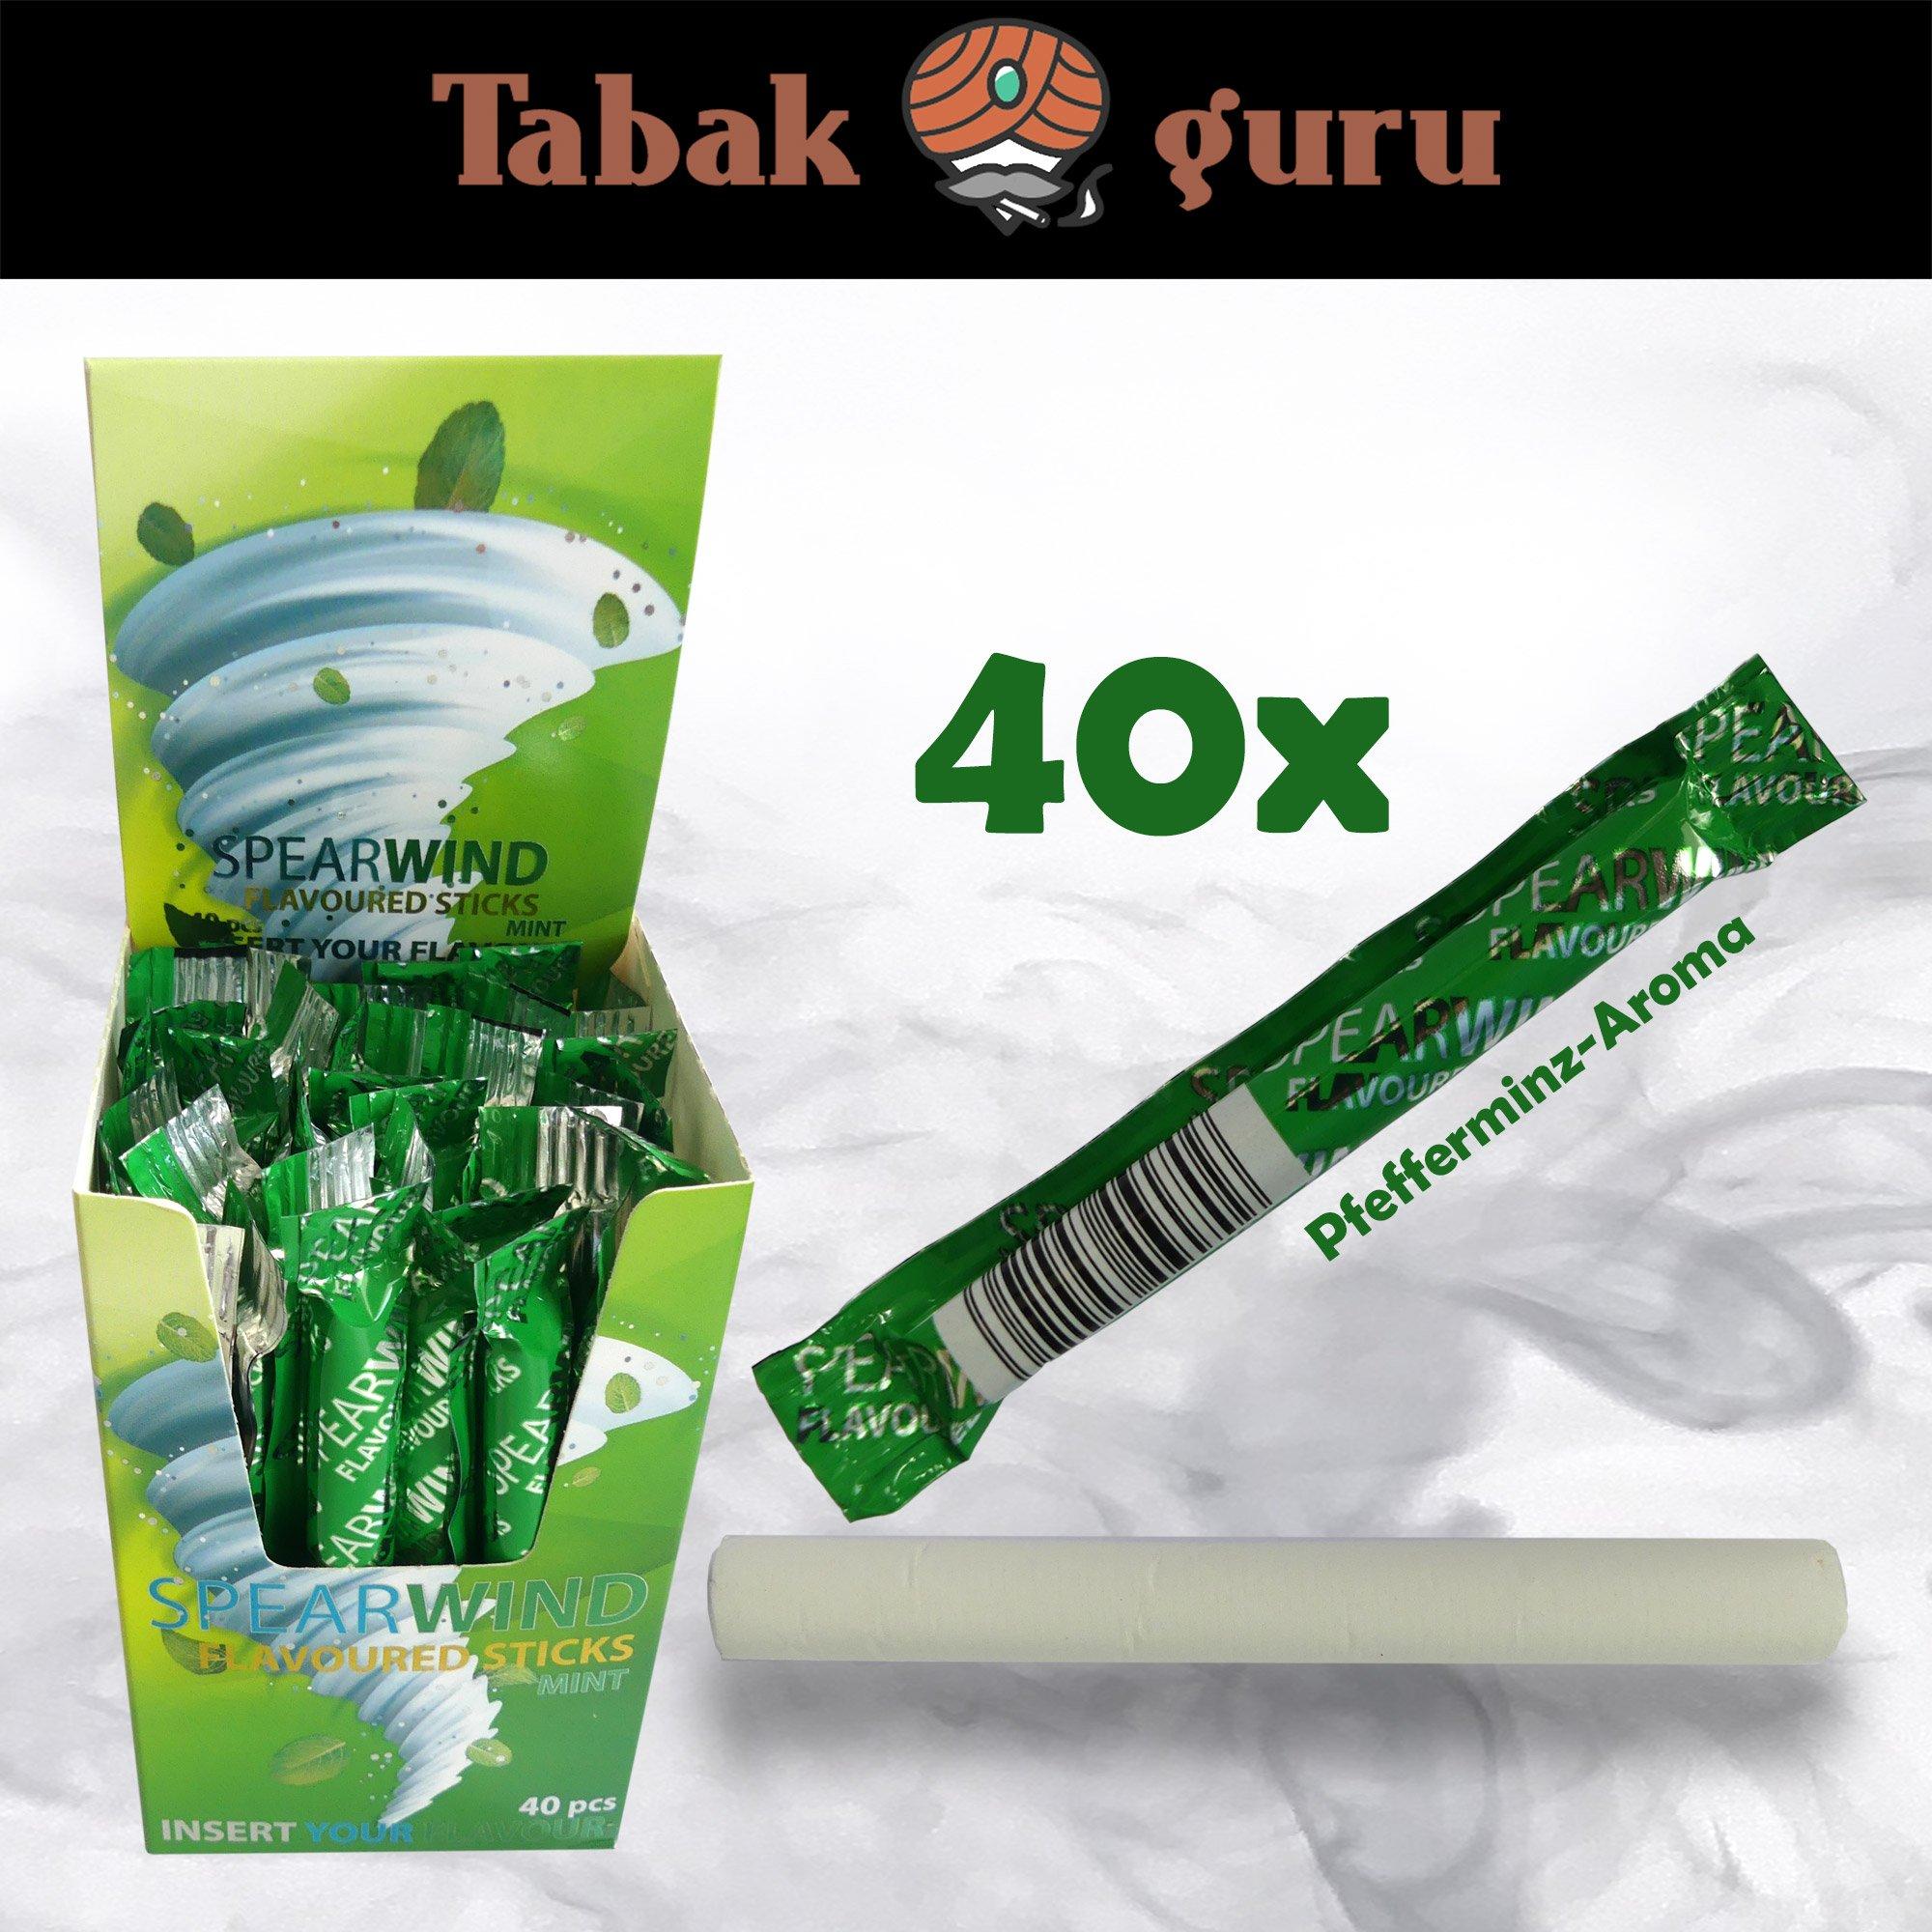 40 x SPEARWIND MINT Pfefferminz-Aroma für Zigaretten & Tabak - Aroma-Sticks